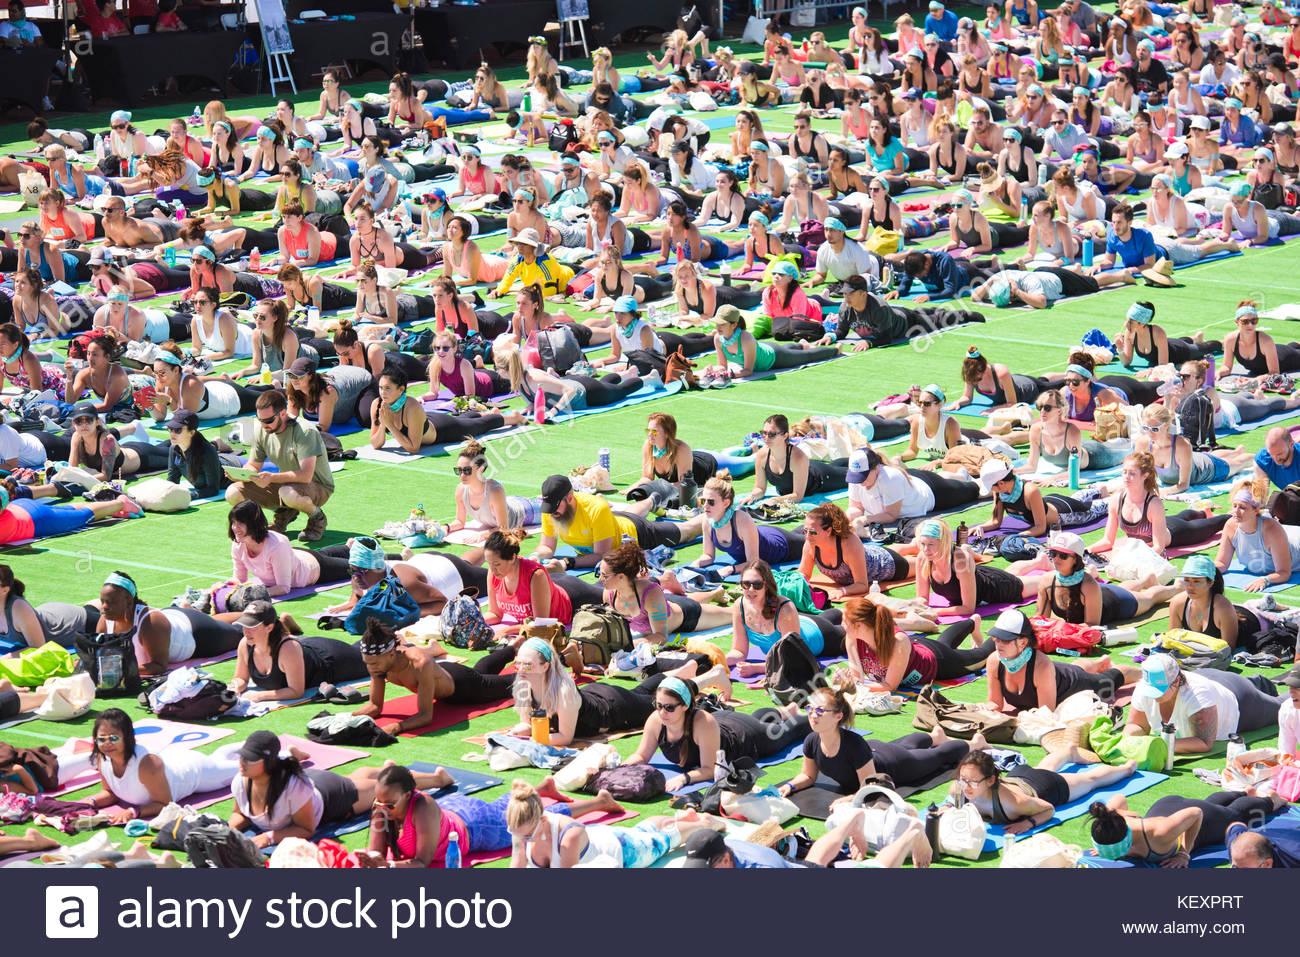 People performing sphinx pose during outdoor yoga festival on Santa Monica Pier in Santa Monica, California, USA - Stock Image